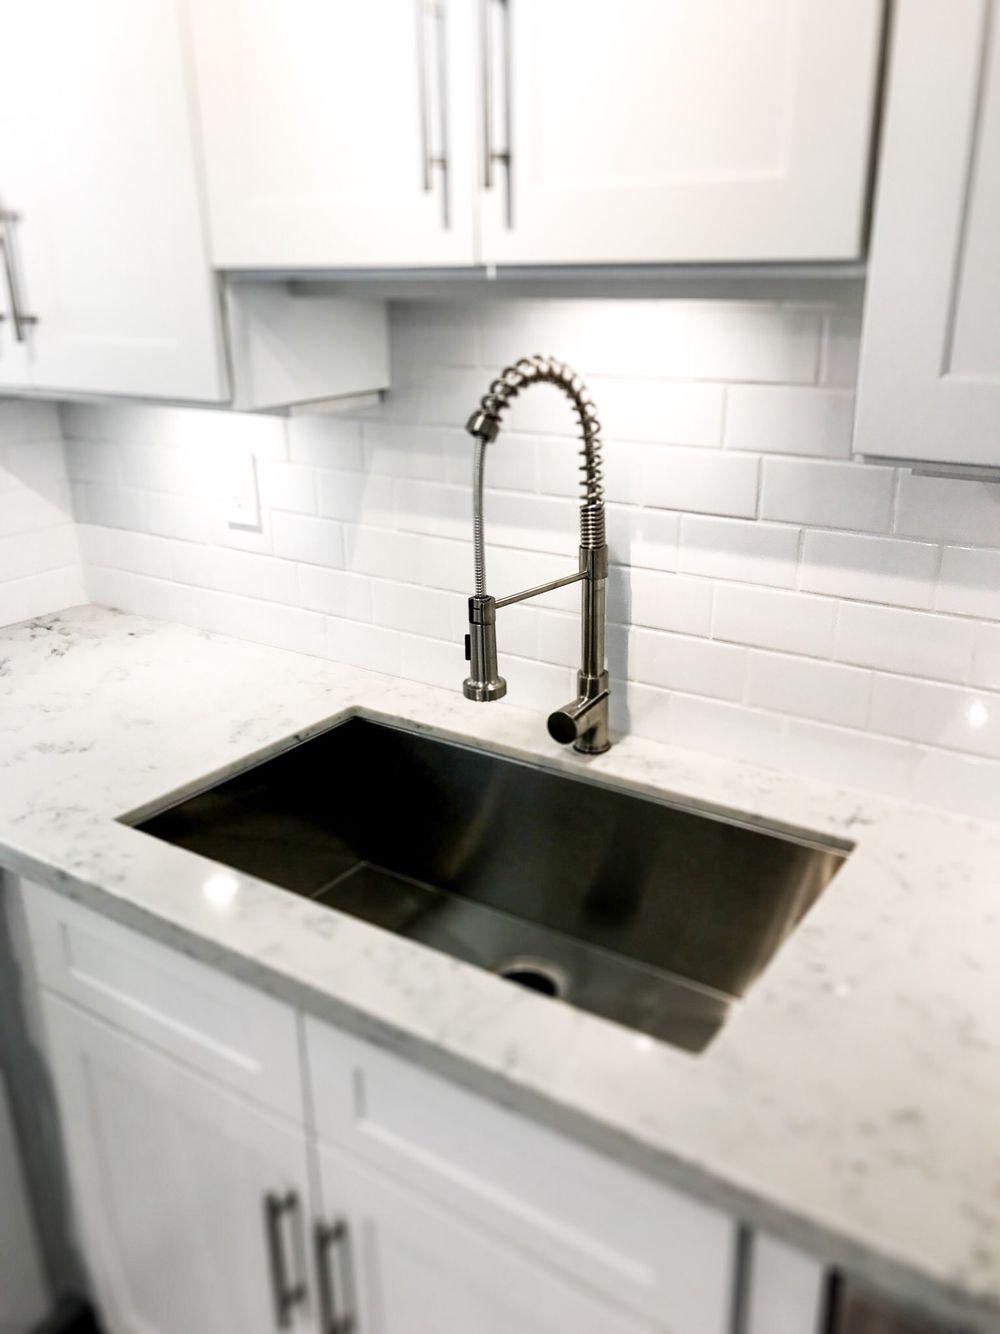 Modern kitchen subway tile backsplash by Gabriel Genier | The ...